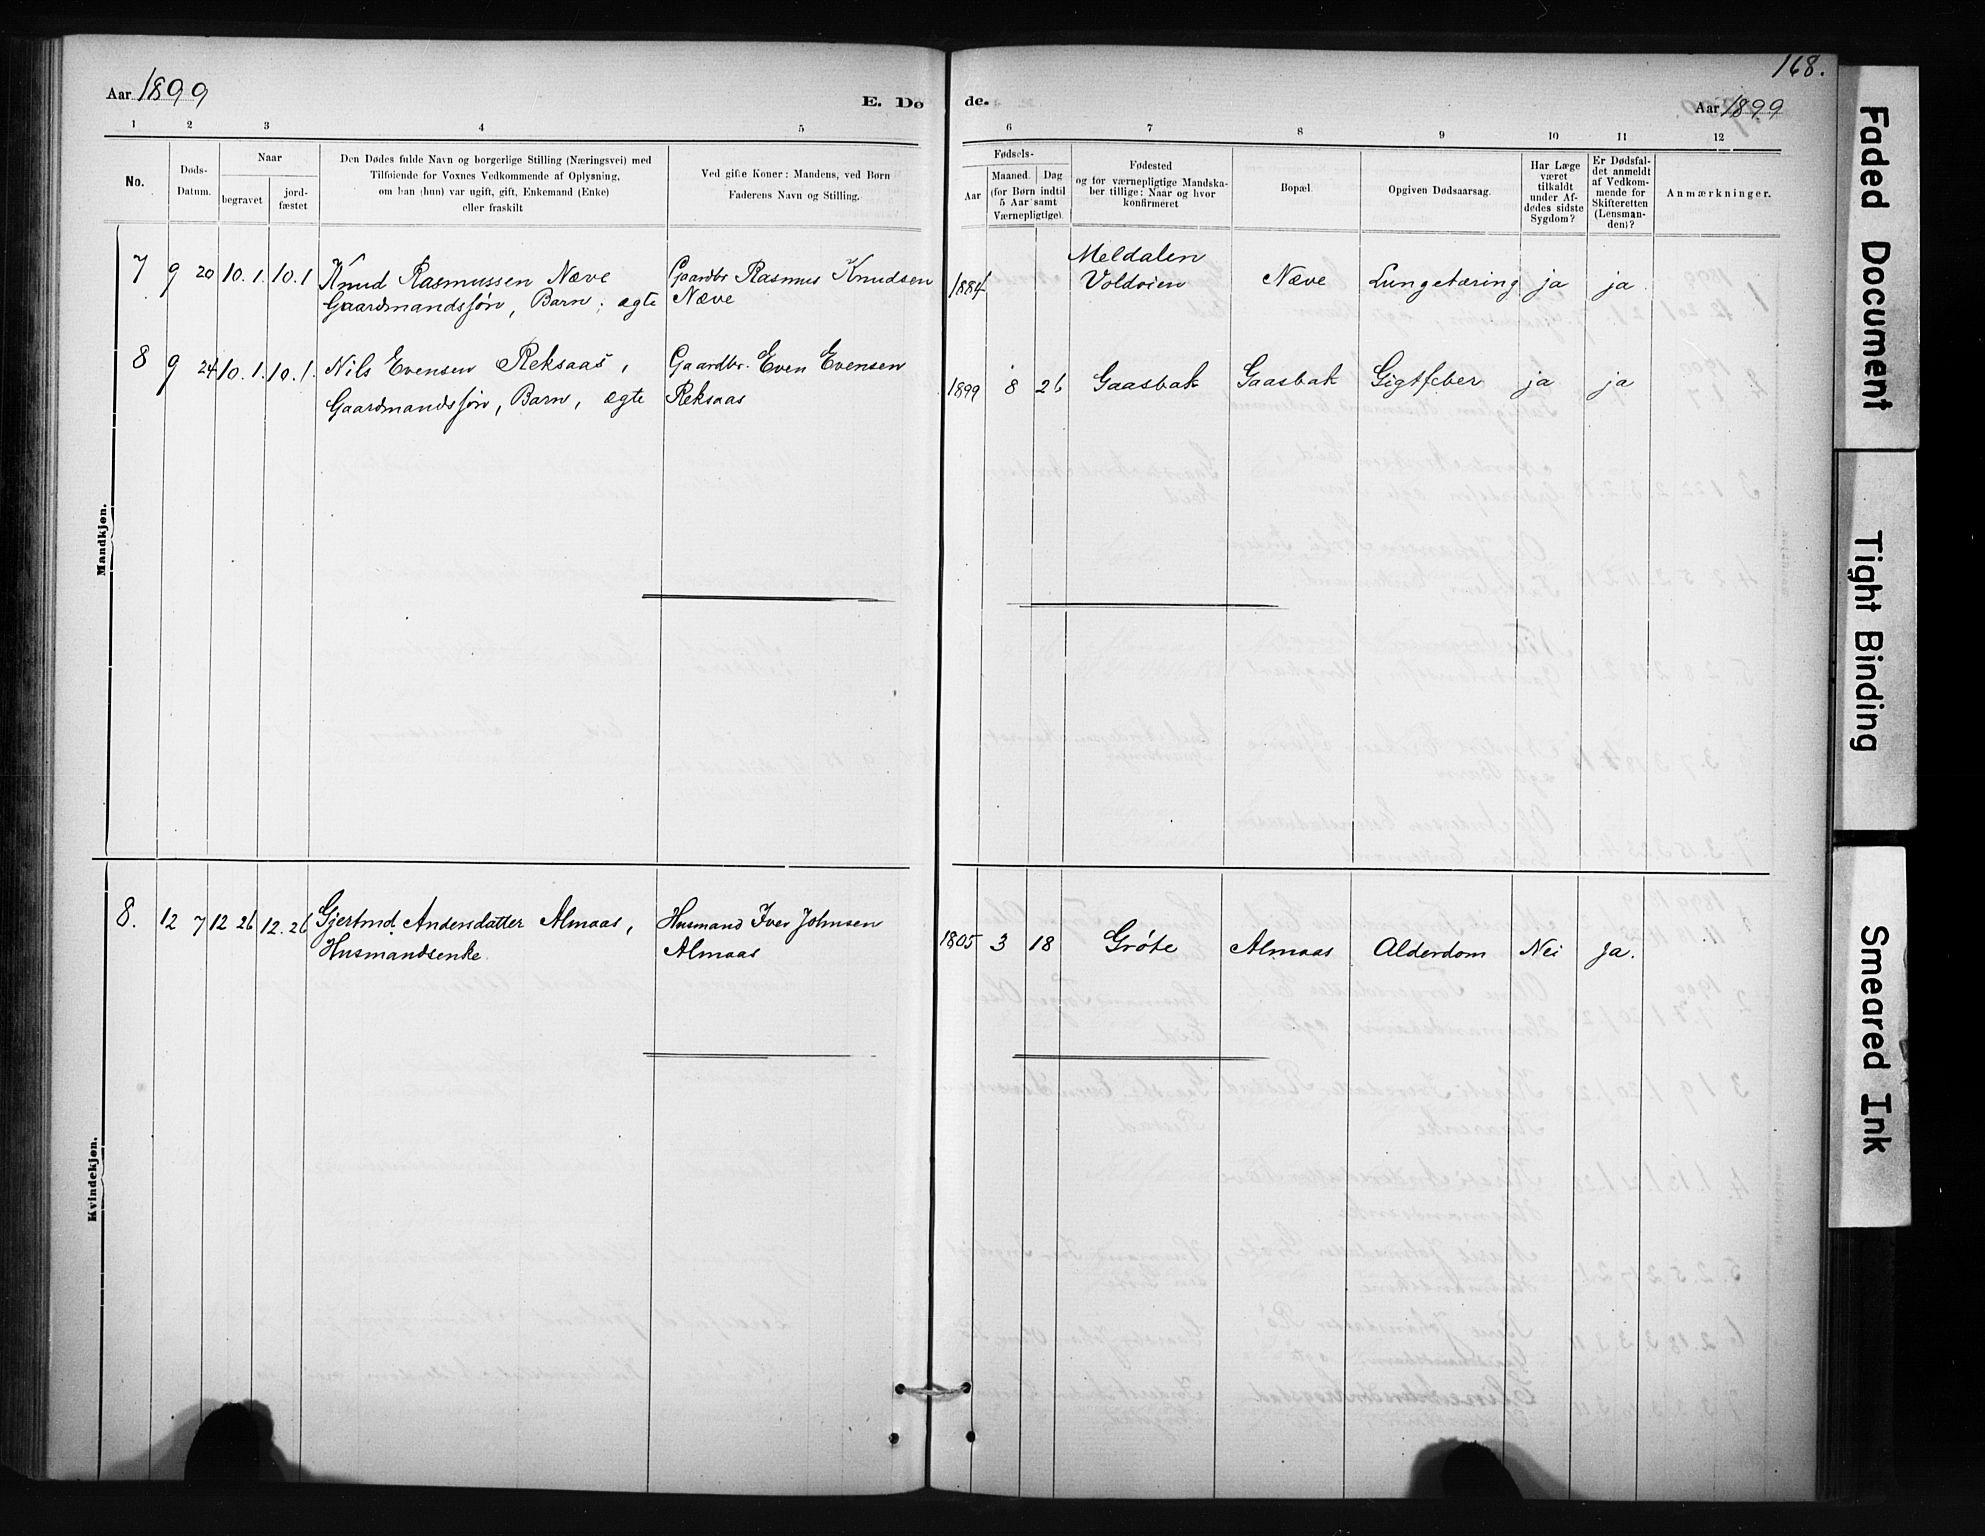 SAT, Ministerialprotokoller, klokkerbøker og fødselsregistre - Sør-Trøndelag, 694/L1127: Parish register (official) no. 694A01, 1887-1905, p. 168